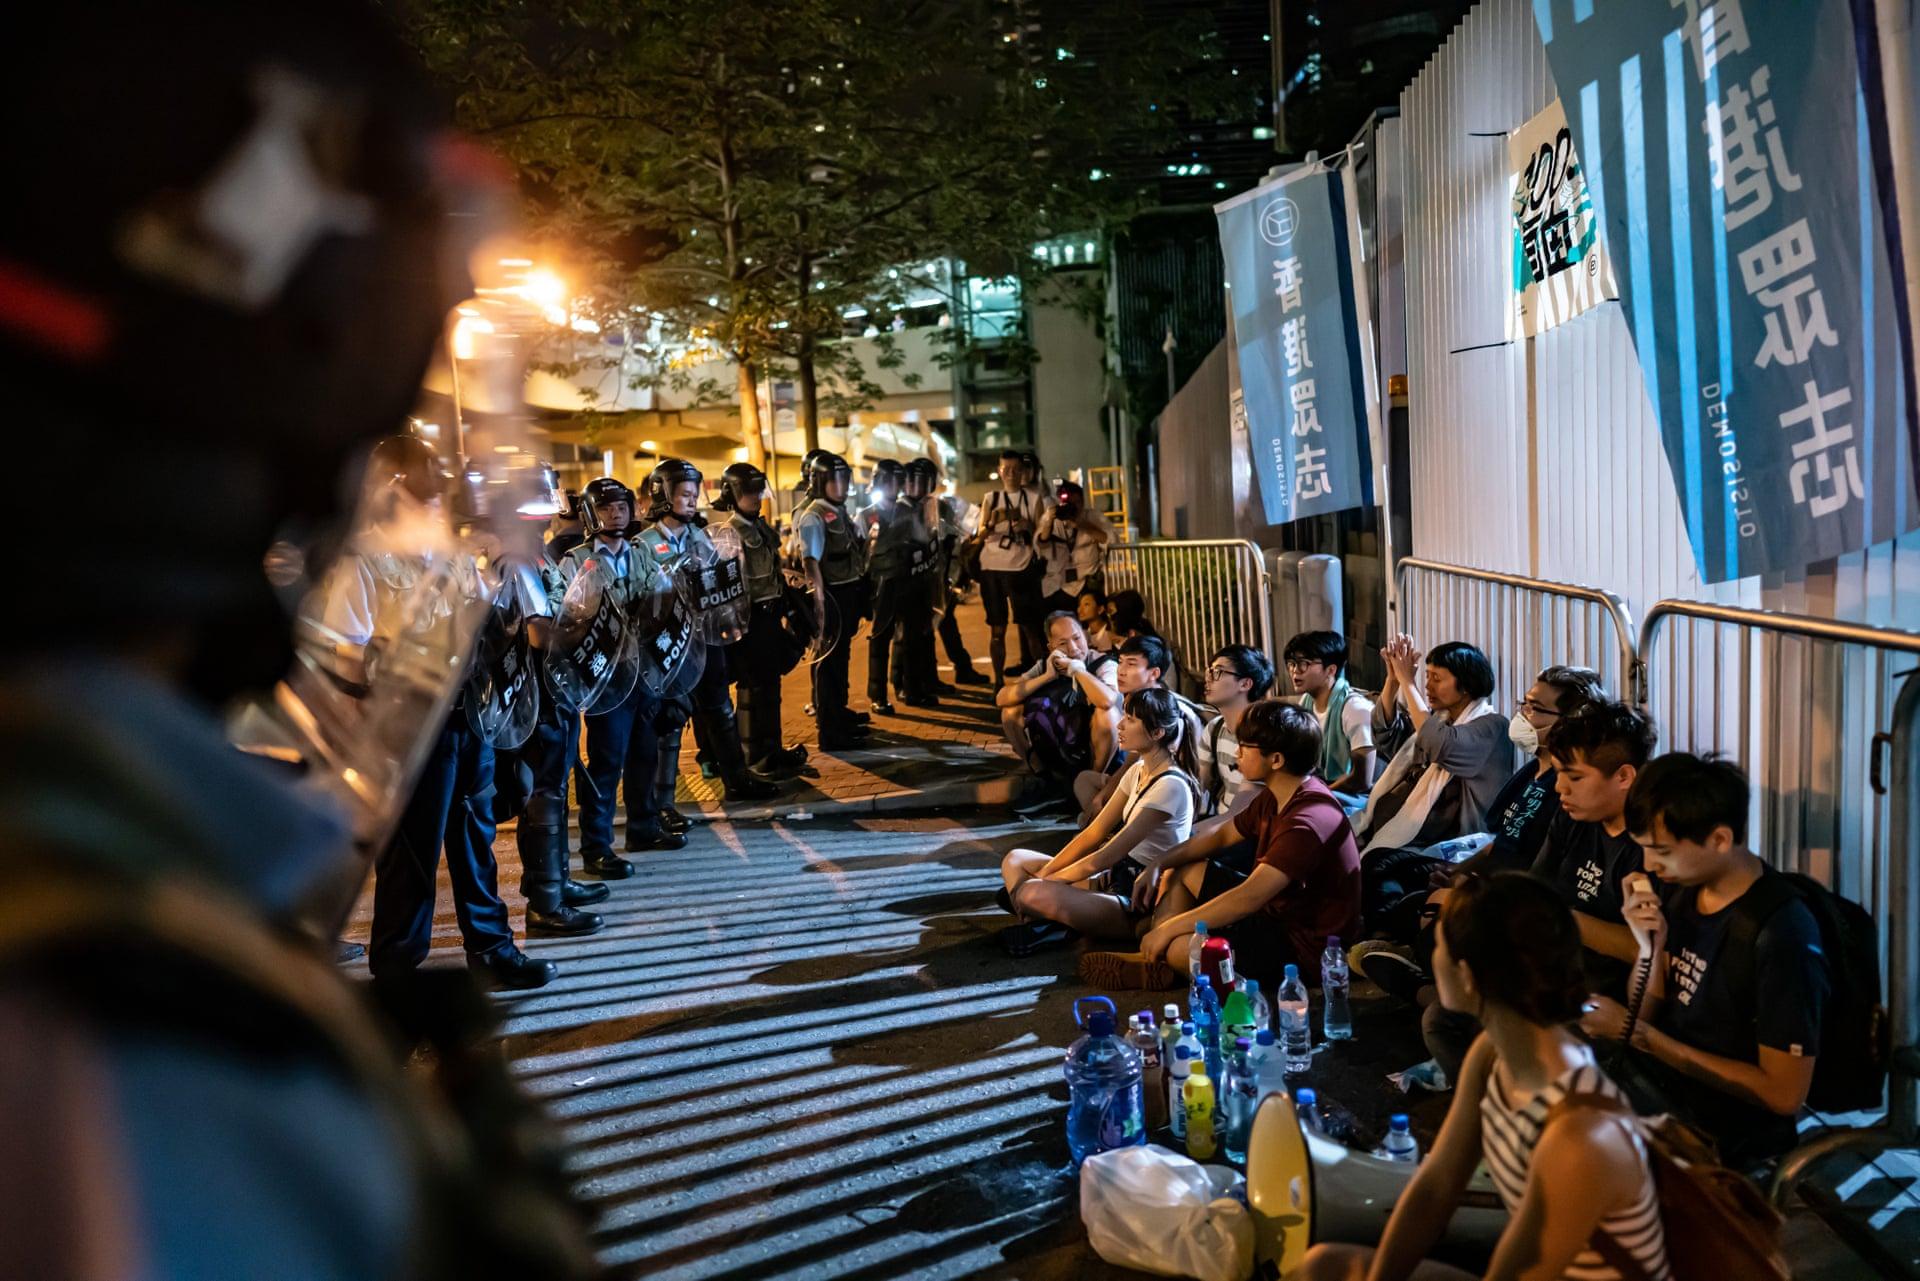 Anthony Kwan/Getty Images/SCANPIX